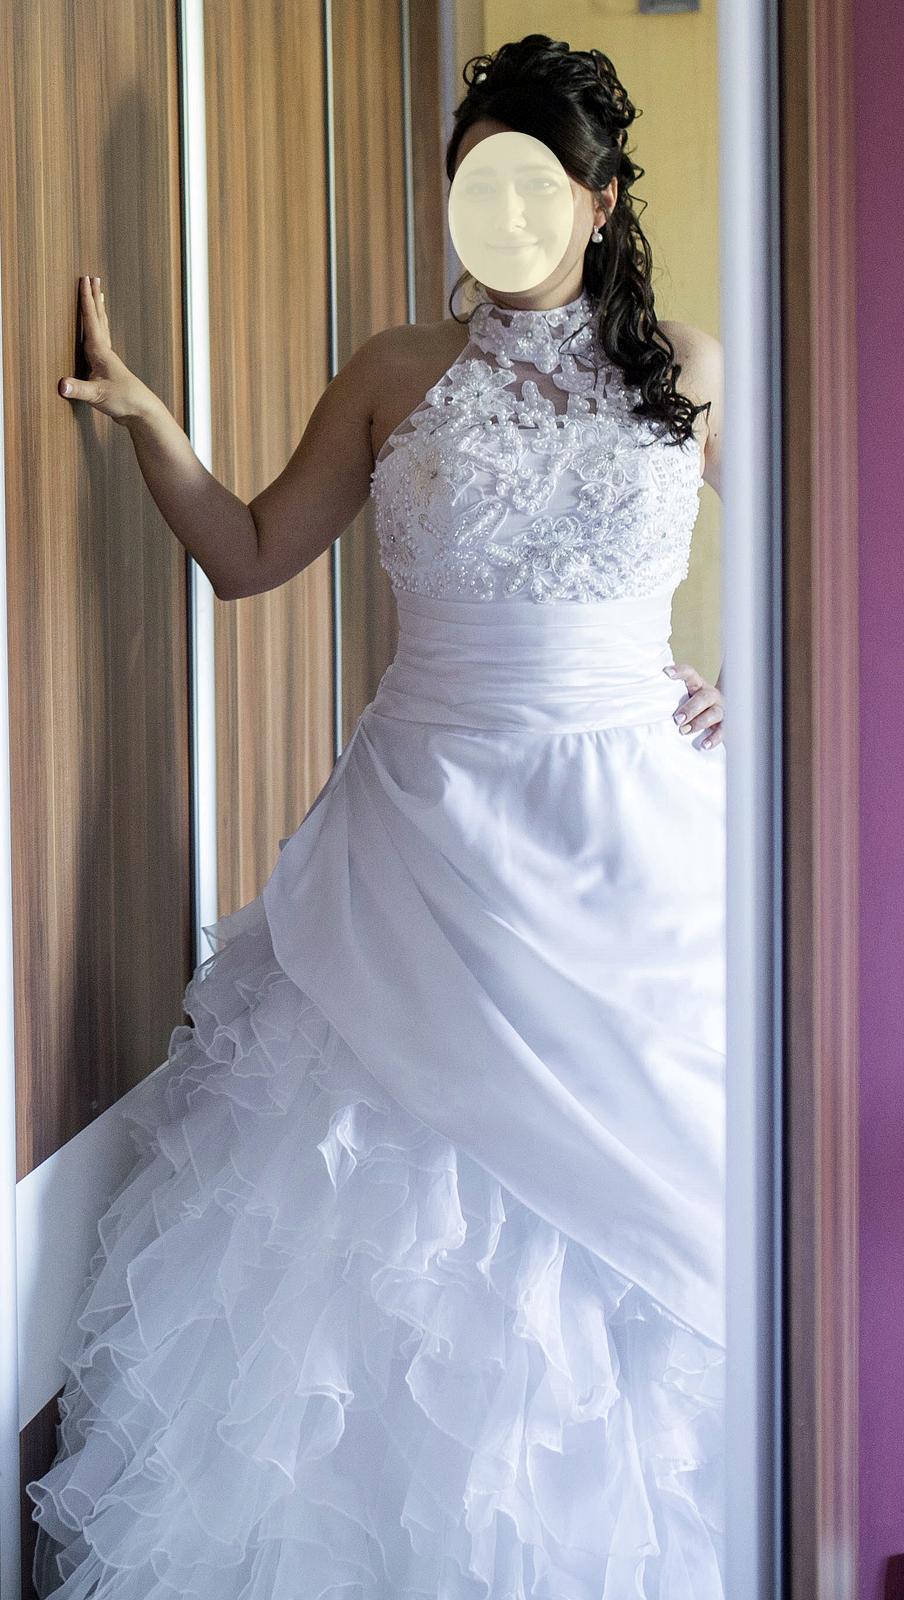 Svadobné šaty vyšívané perličkami - veľ. 38-42 - Obrázek č. 3